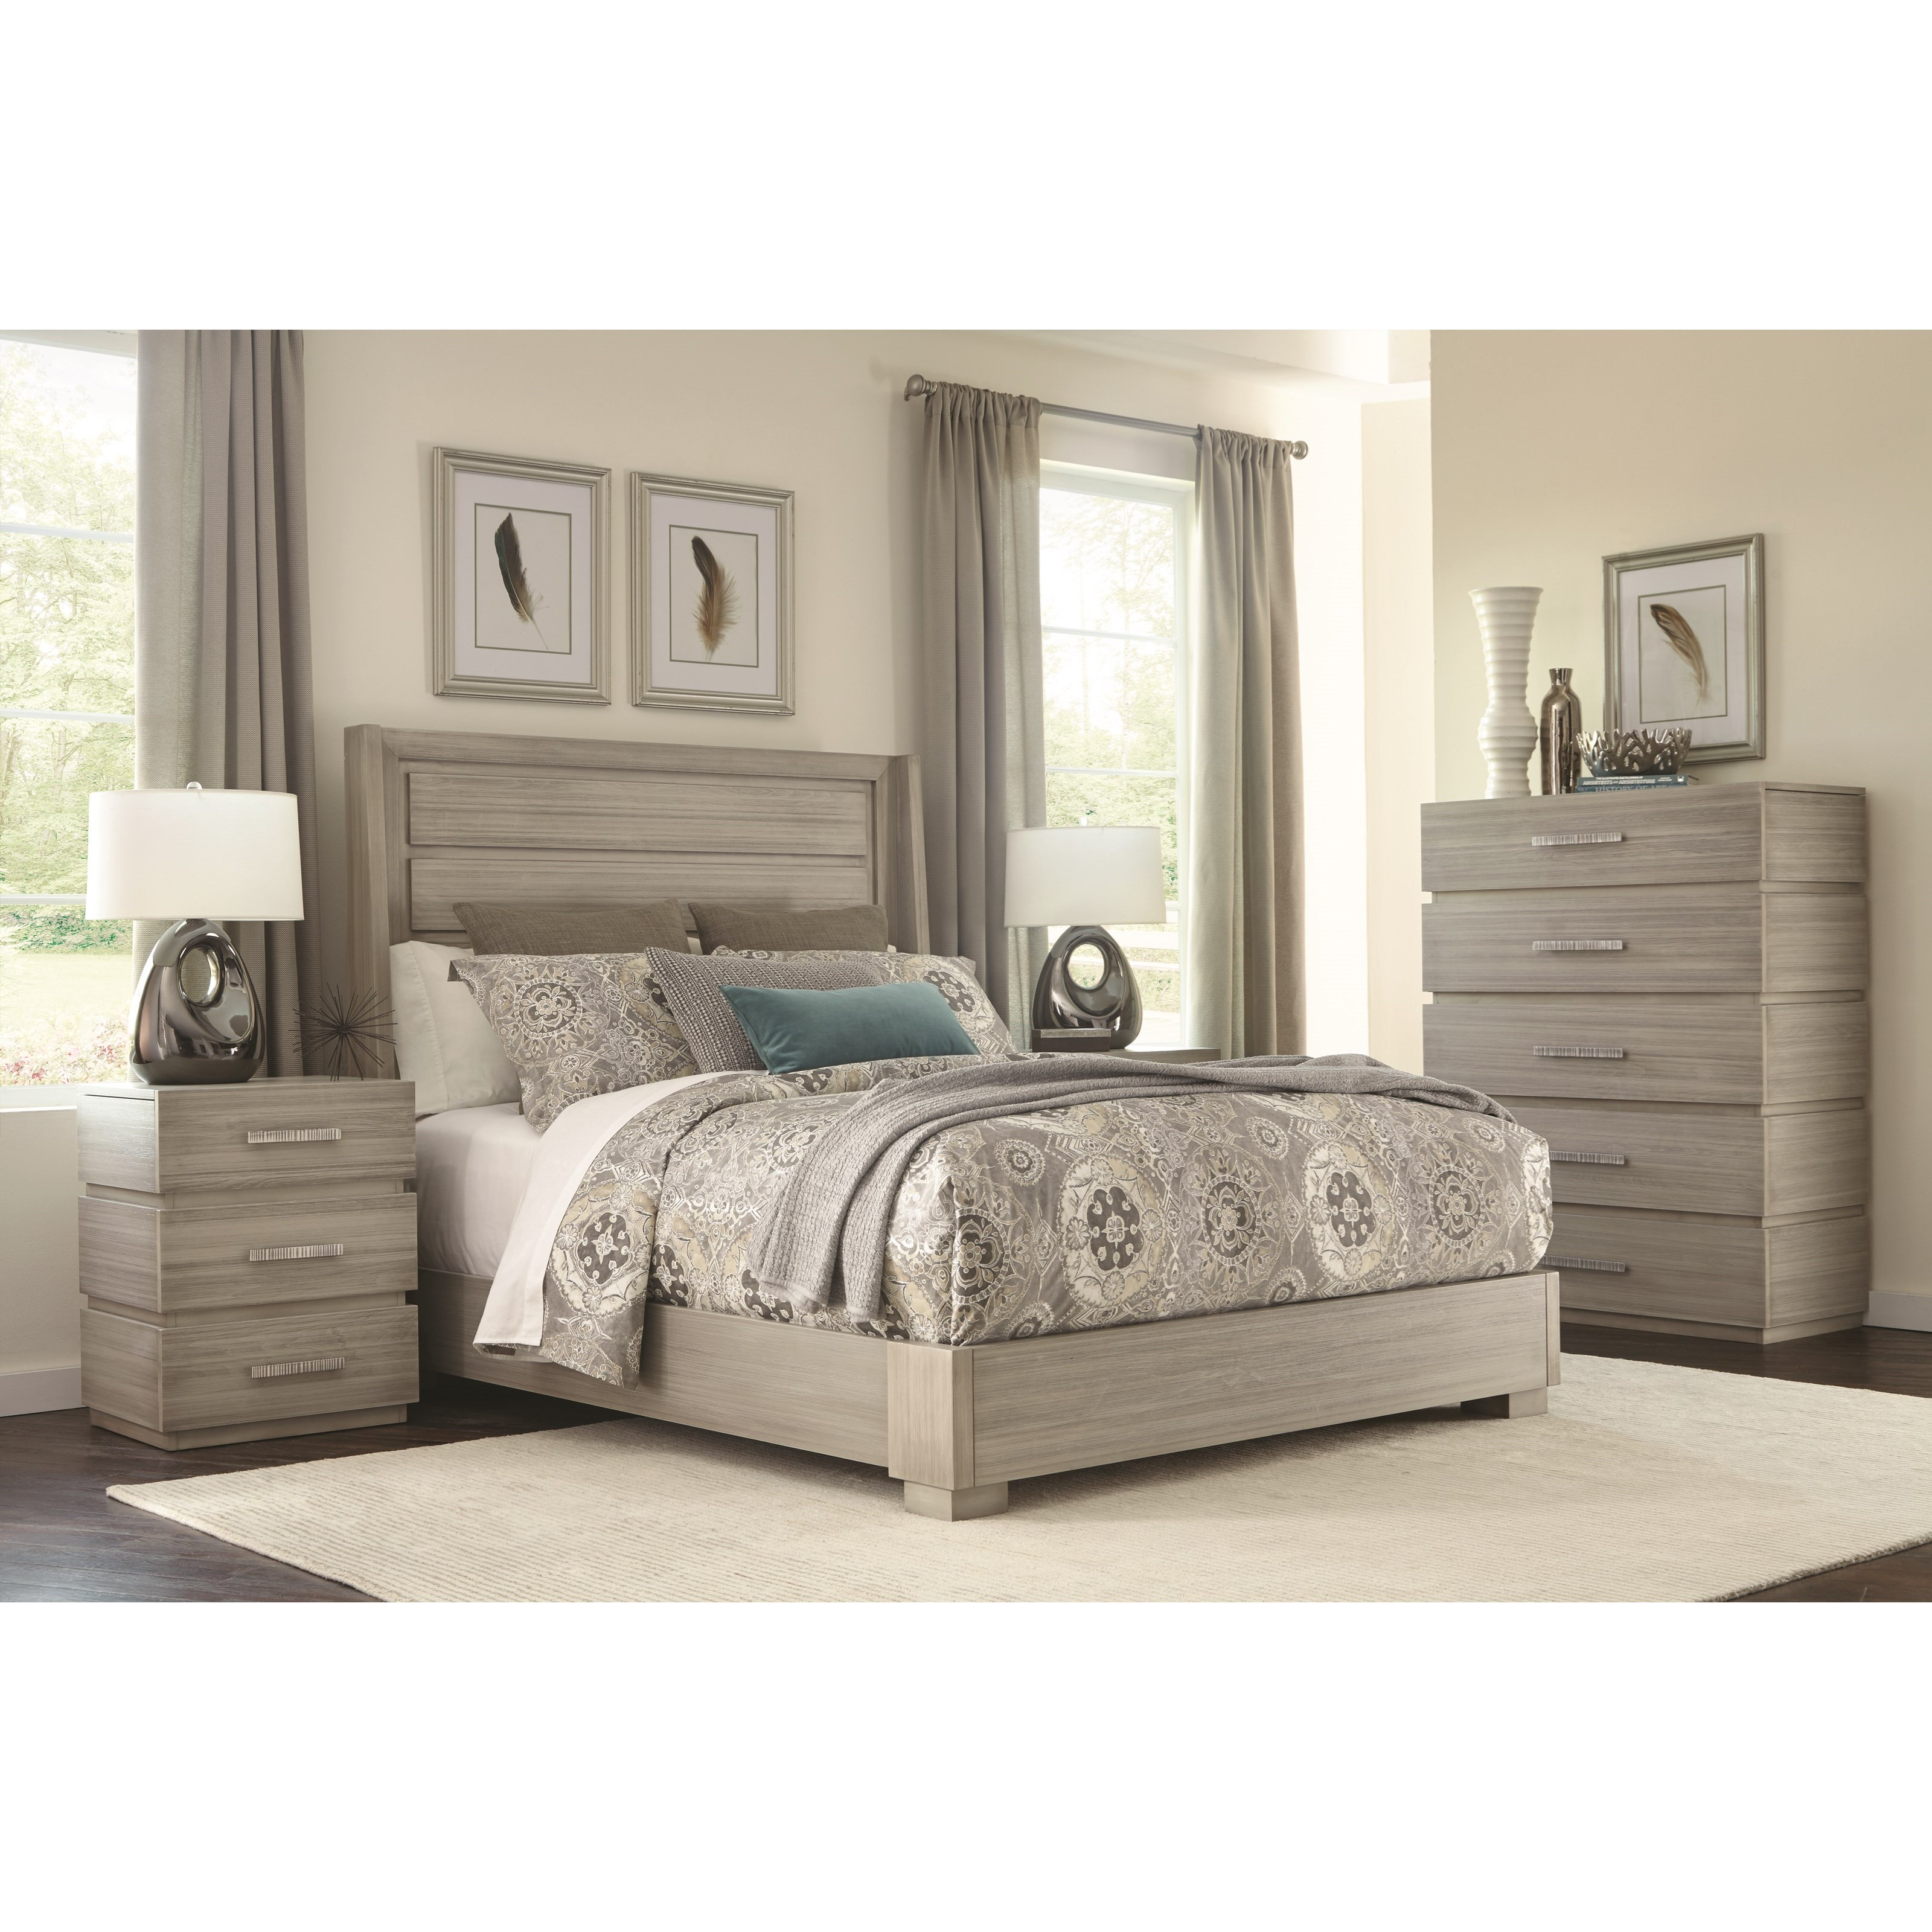 bedroom furniture durham. Durham Modern Simplicity Queen Bedroom Group - Item Number: 168 Q 2 Furniture M